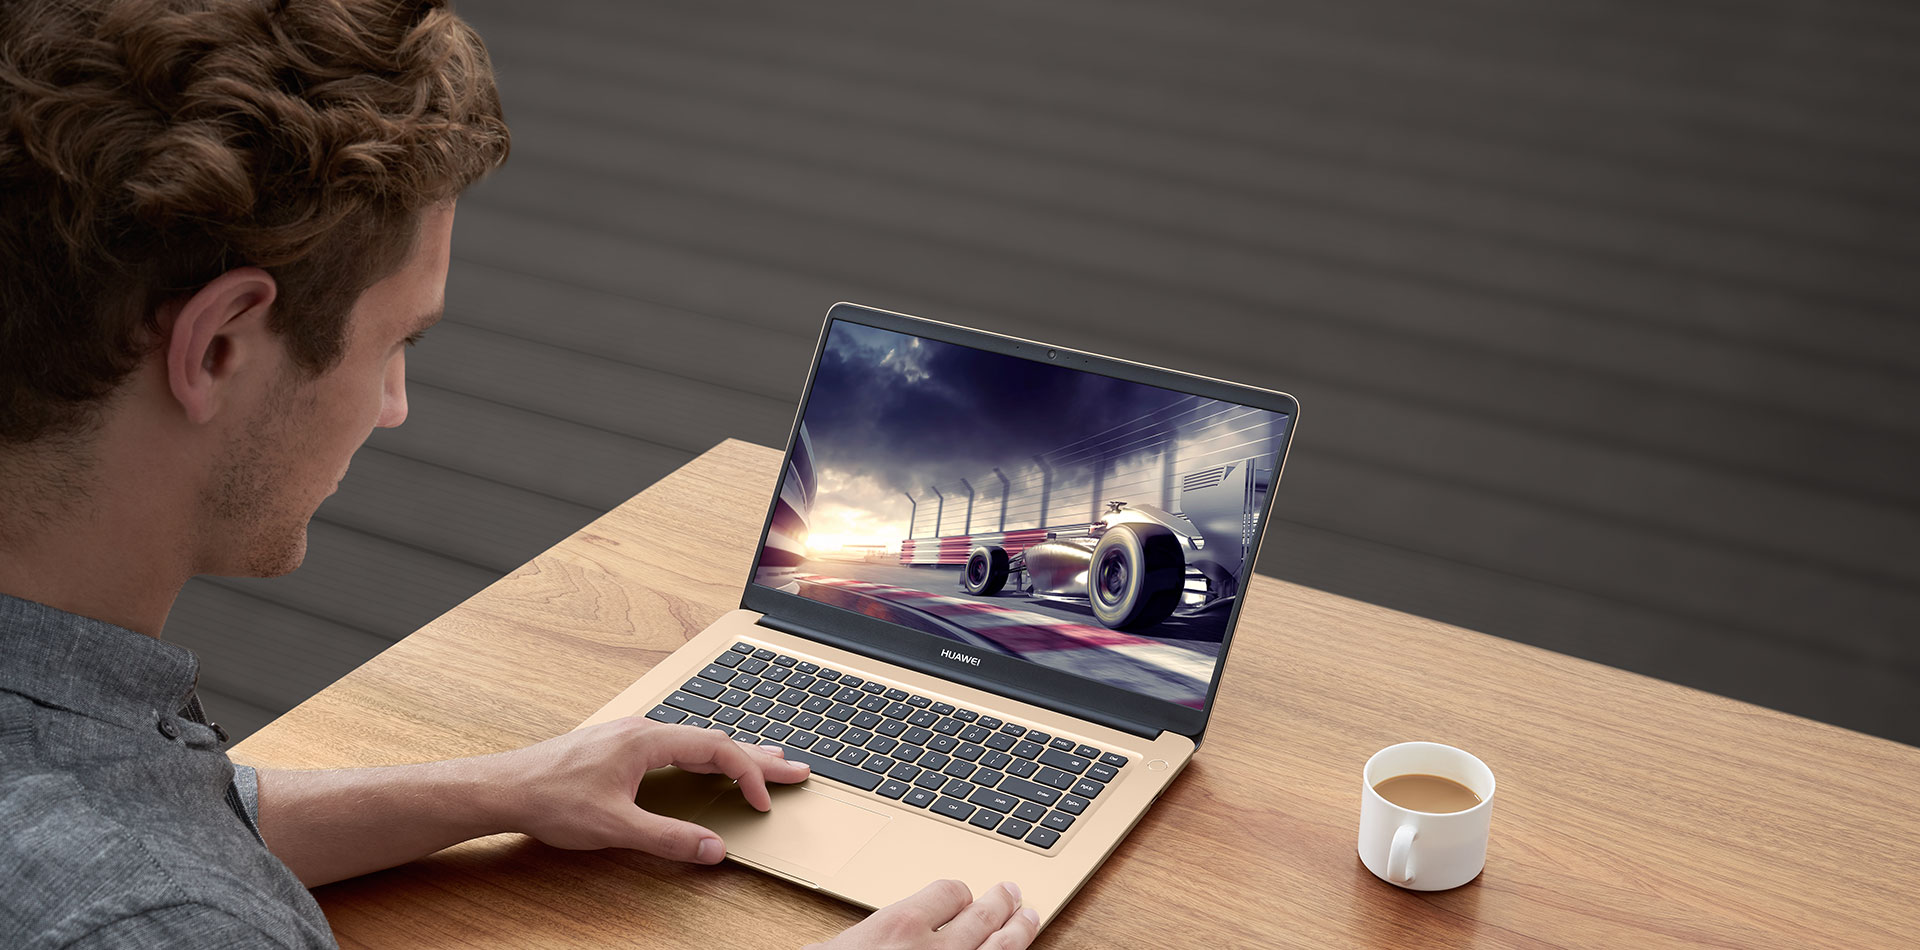 Huawei MateBook D Huawei Expands Its MateBook Mobile PC Range